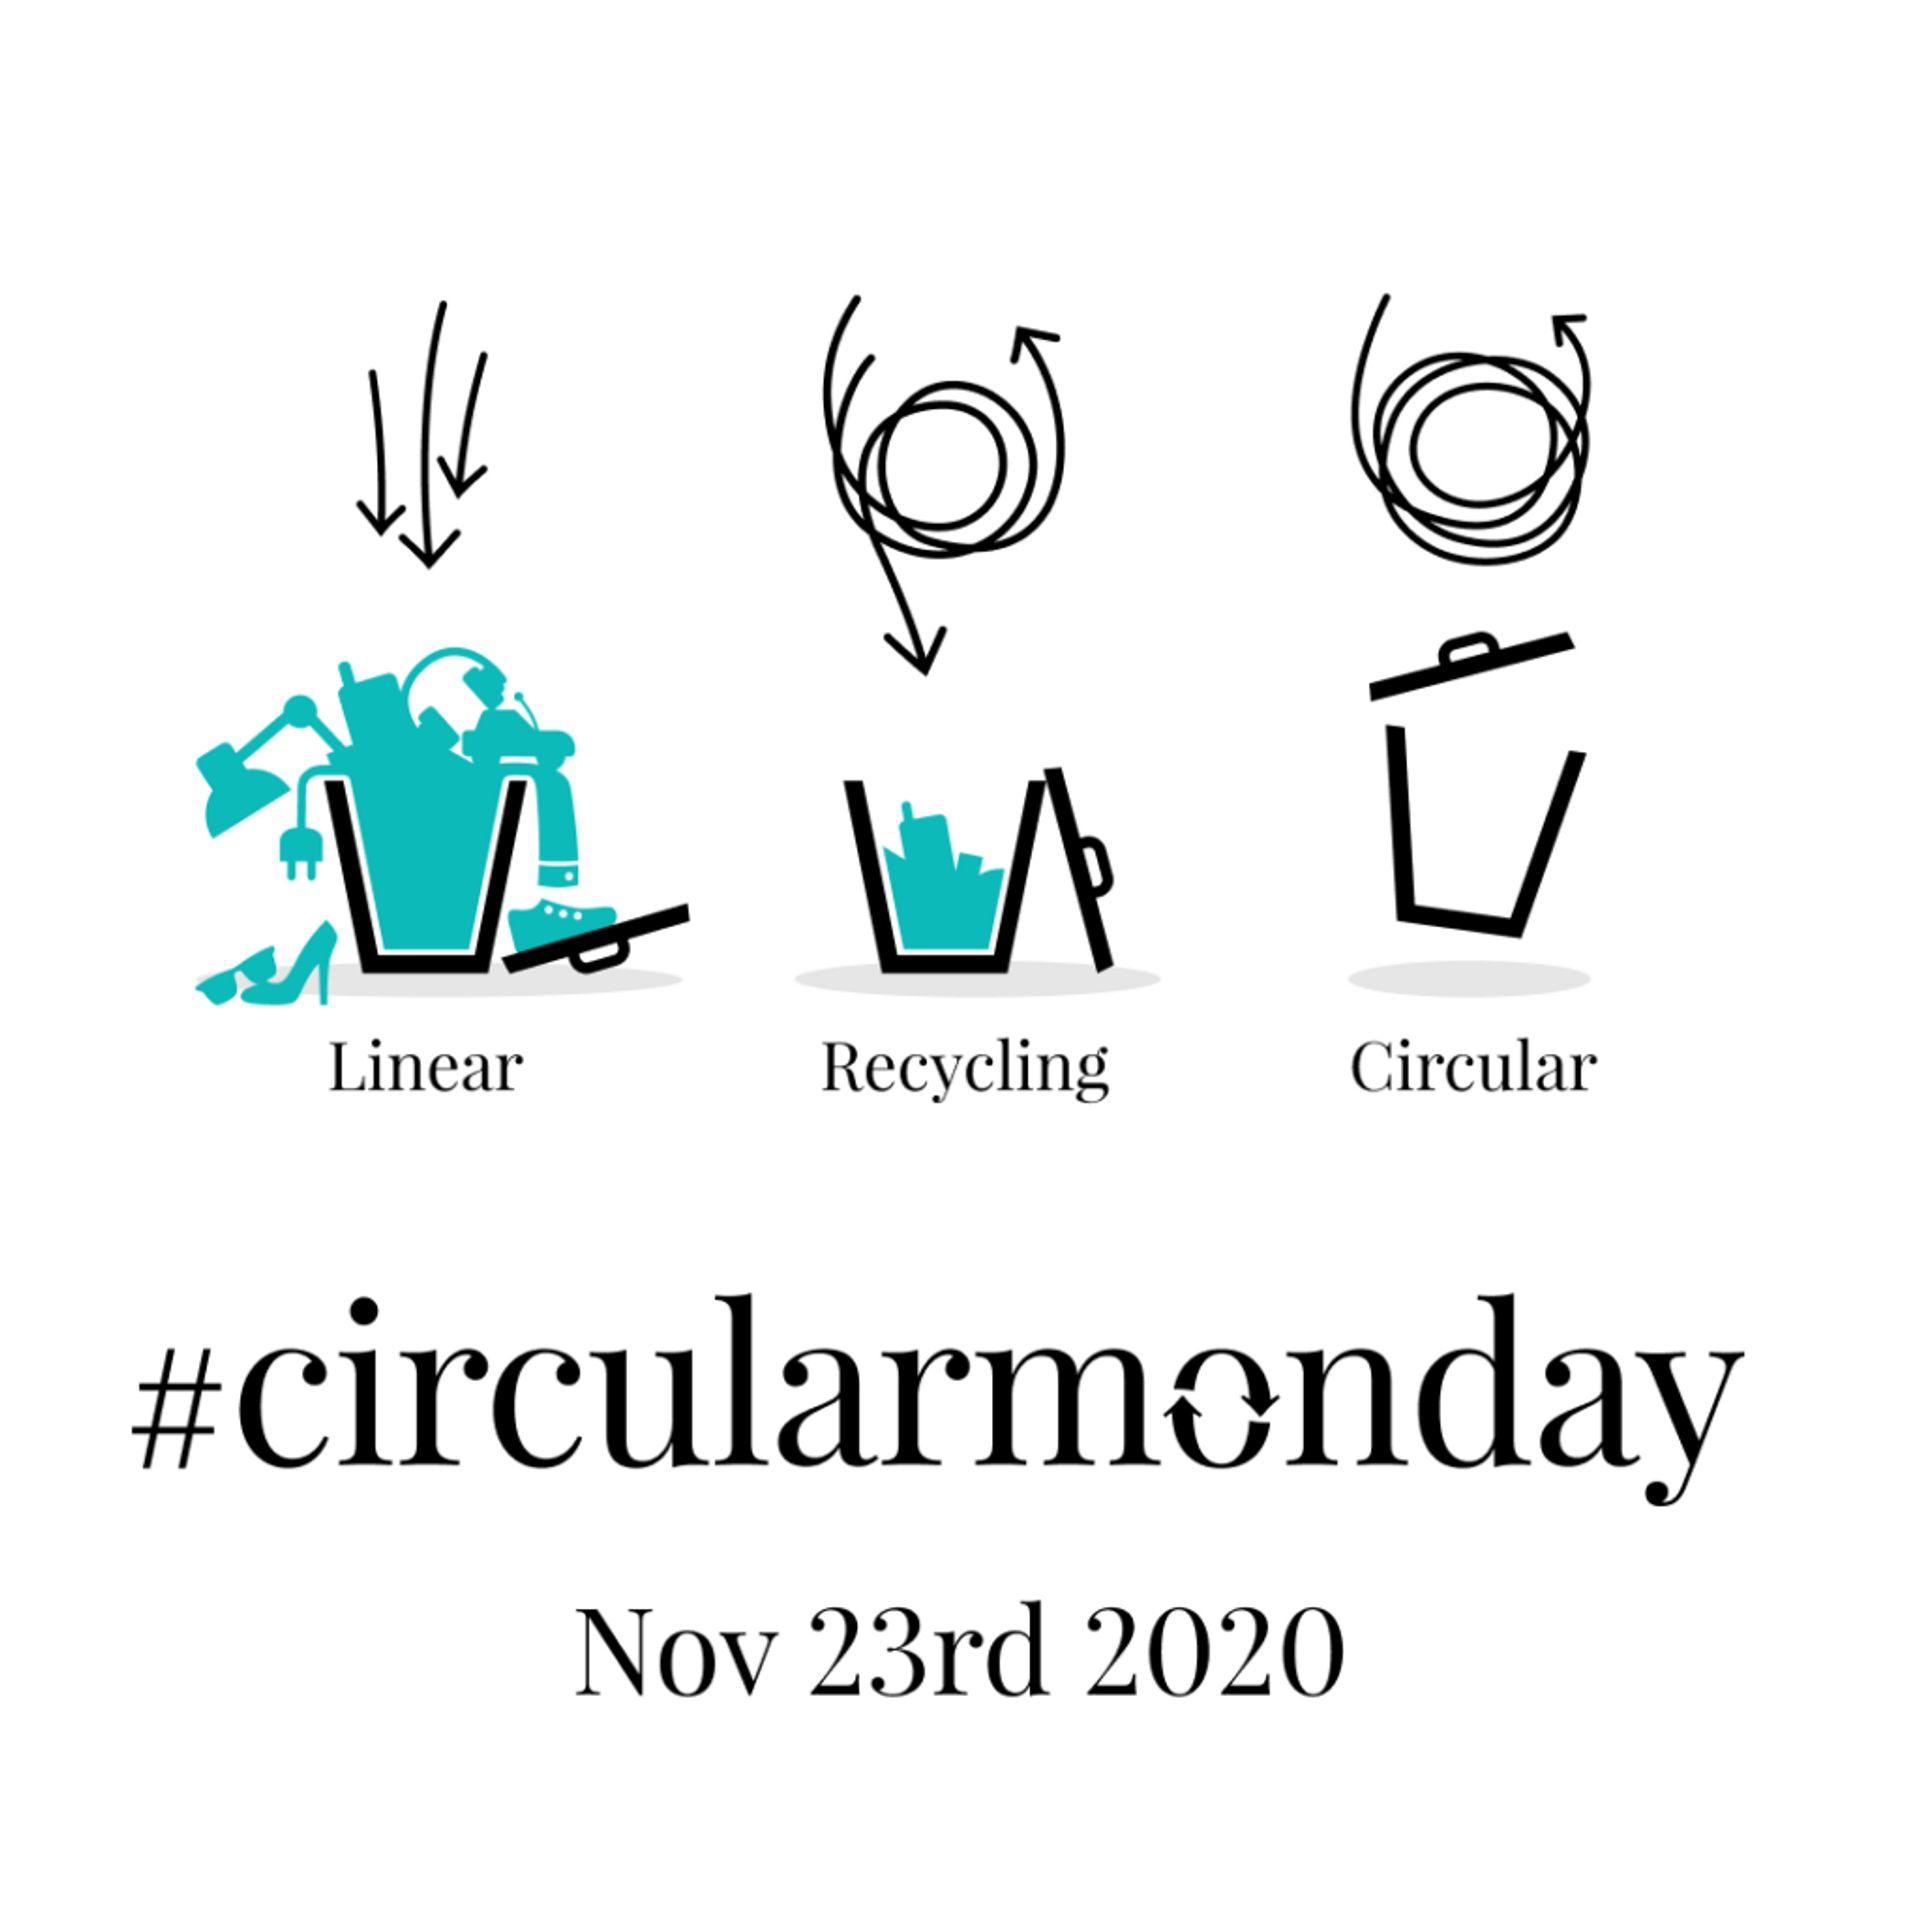 Illustration with the text 'Linnear. Recycling. Circuclar. #circularmonday. Nov 23rd 2020'.